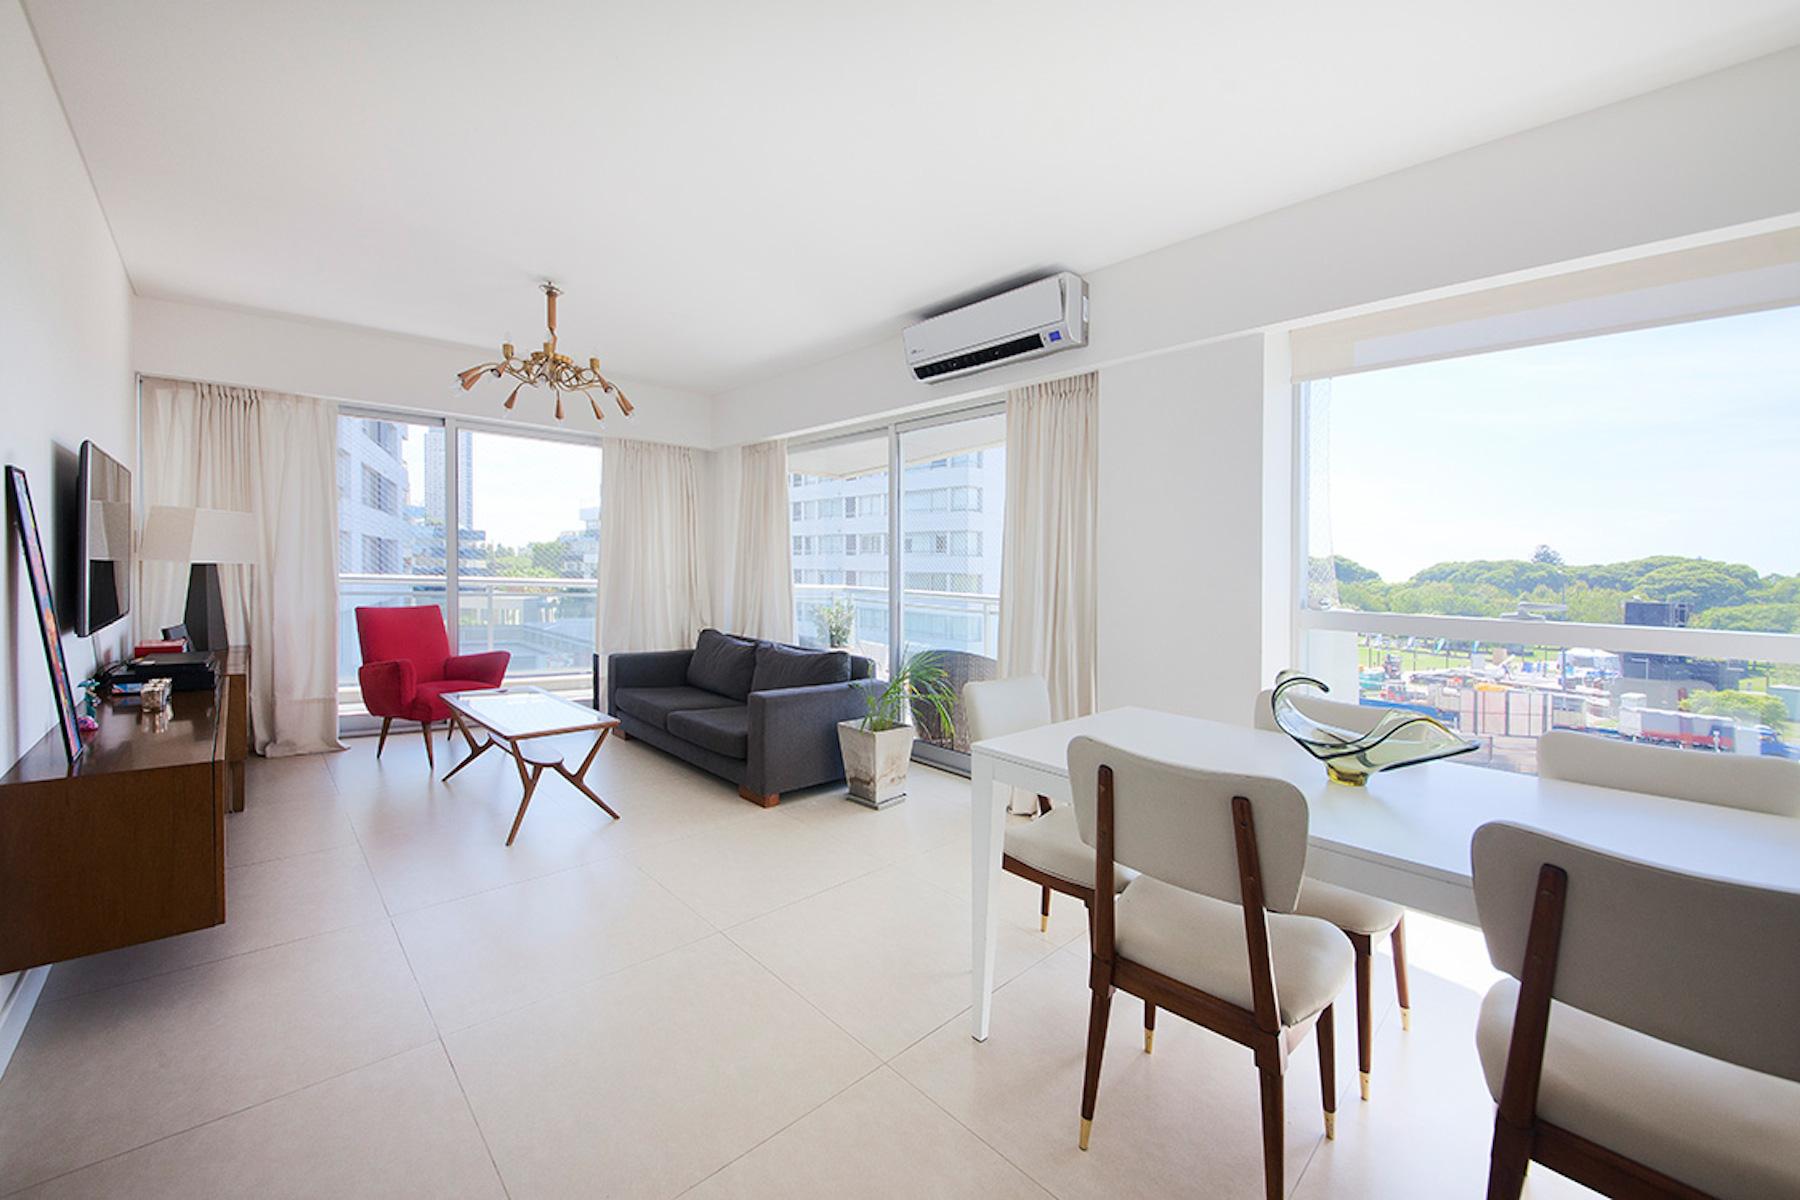 Appartamento per Vendita alle ore Harbour Residences Lola Mora 457 Capital Federal, Buenos Aires, 1107 Argentina